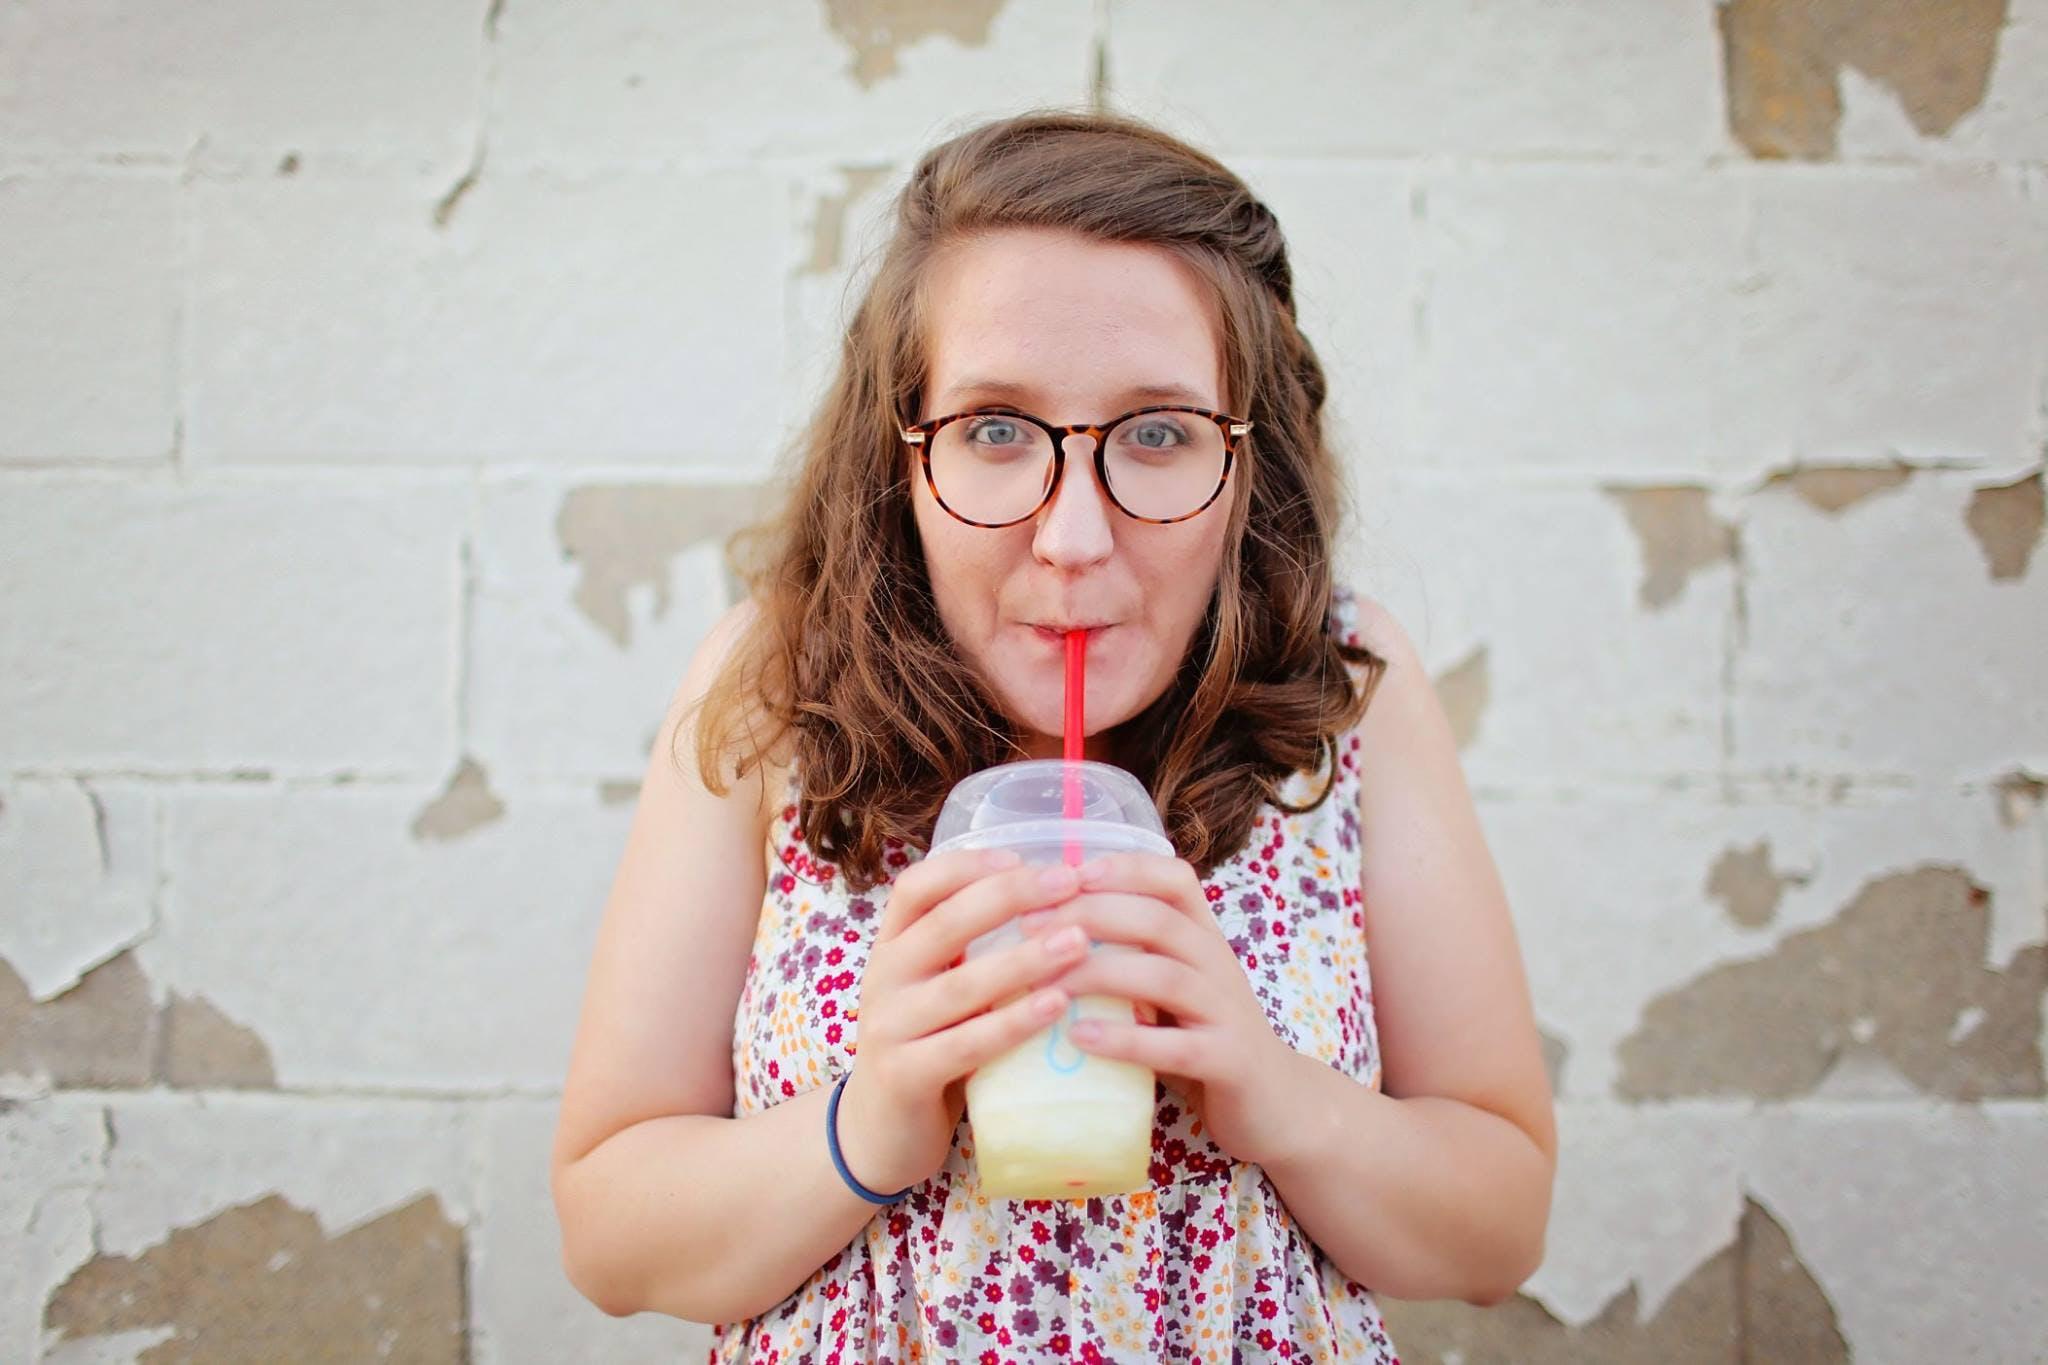 Woman in Black Framed Eyeglasses Drinking